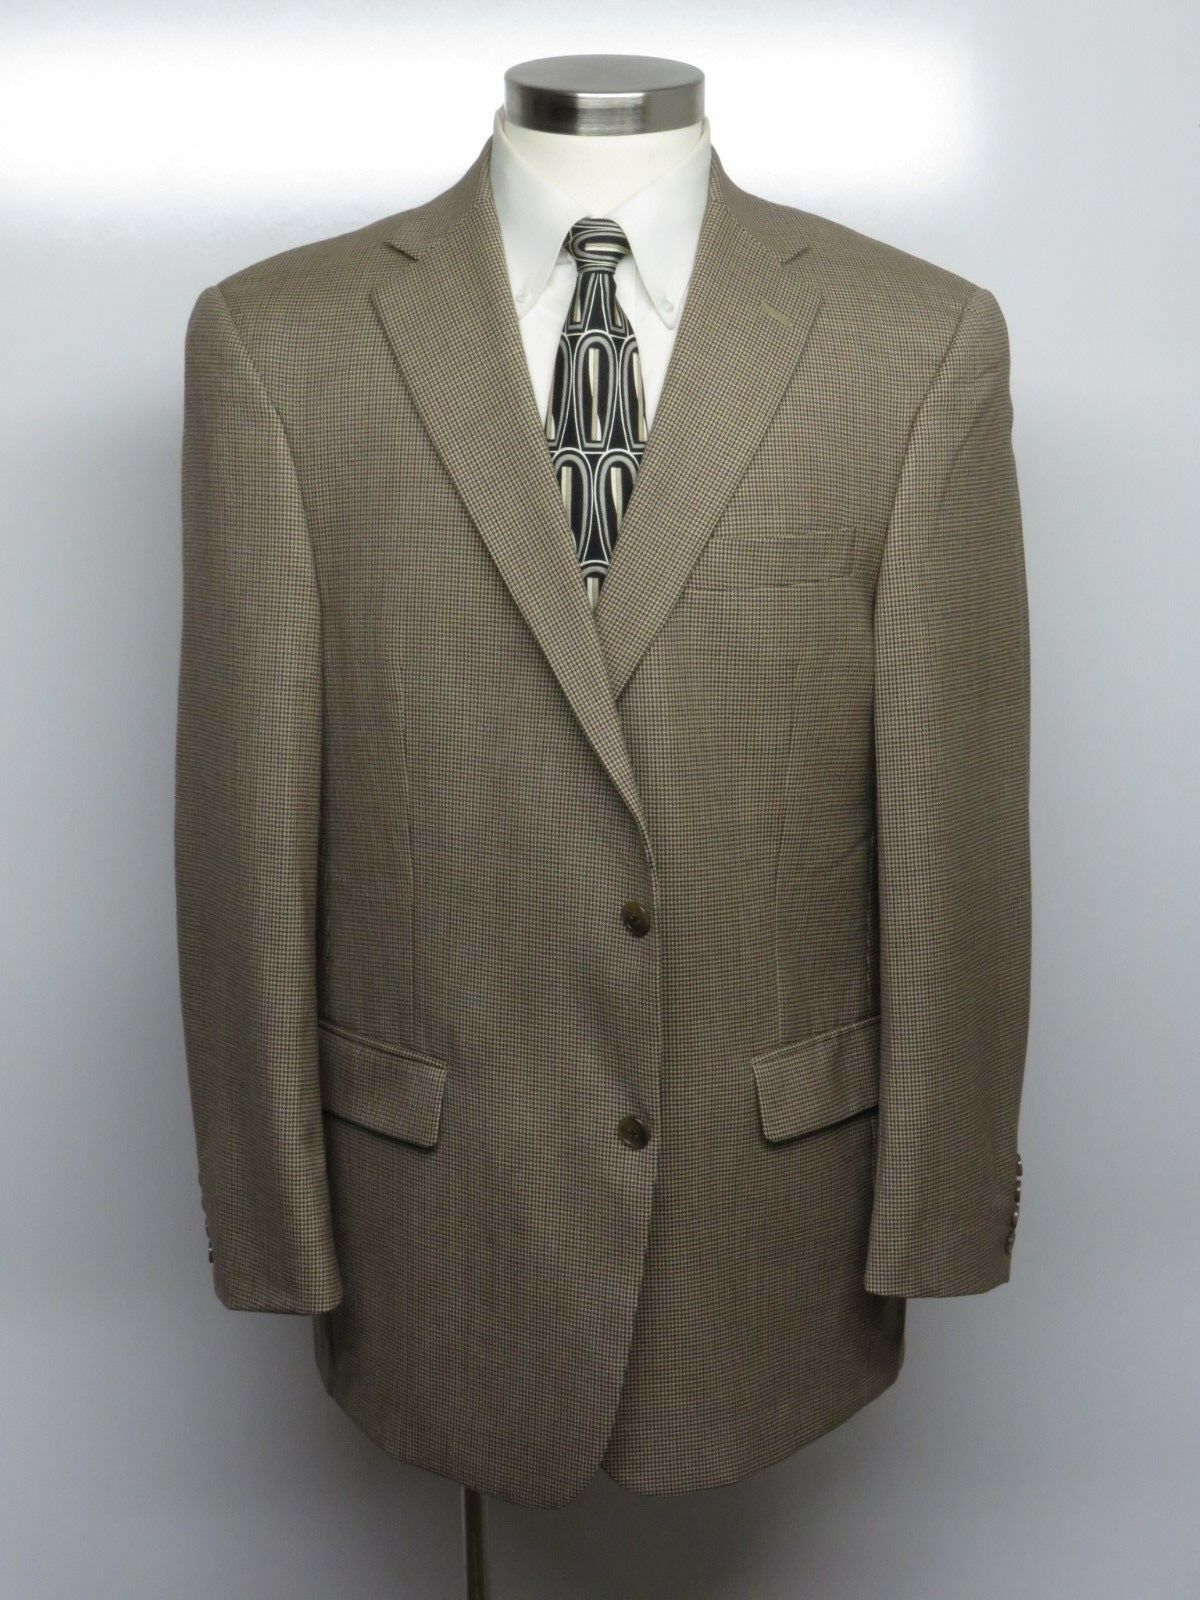 HART SCHAFFNER MARX Sport Coat 44R BeigeHoundstooth 100% Wool CURRENT MODEL 295